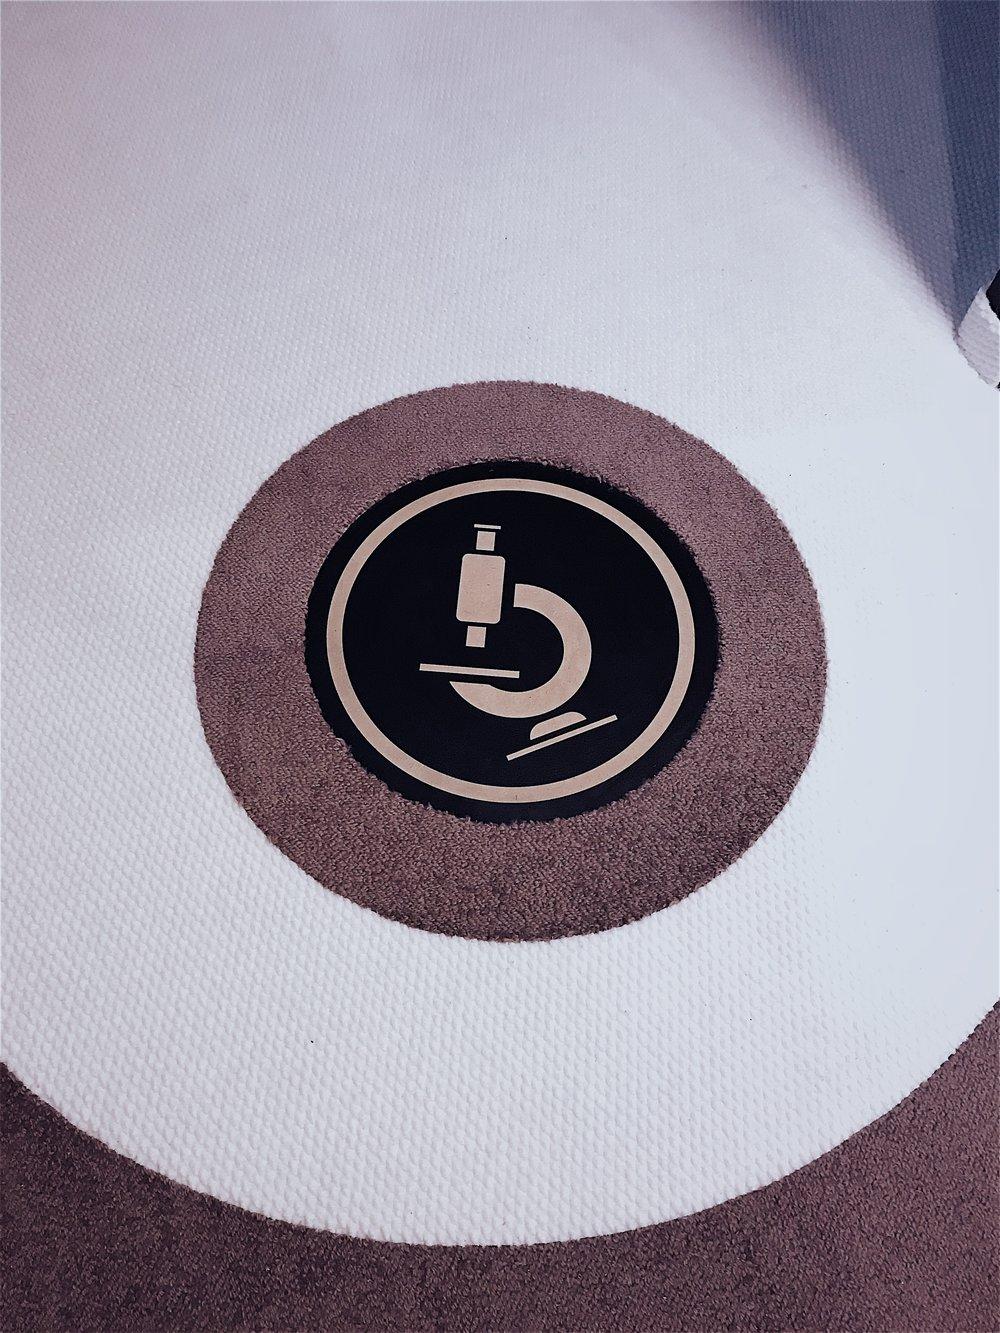 carpet-branded